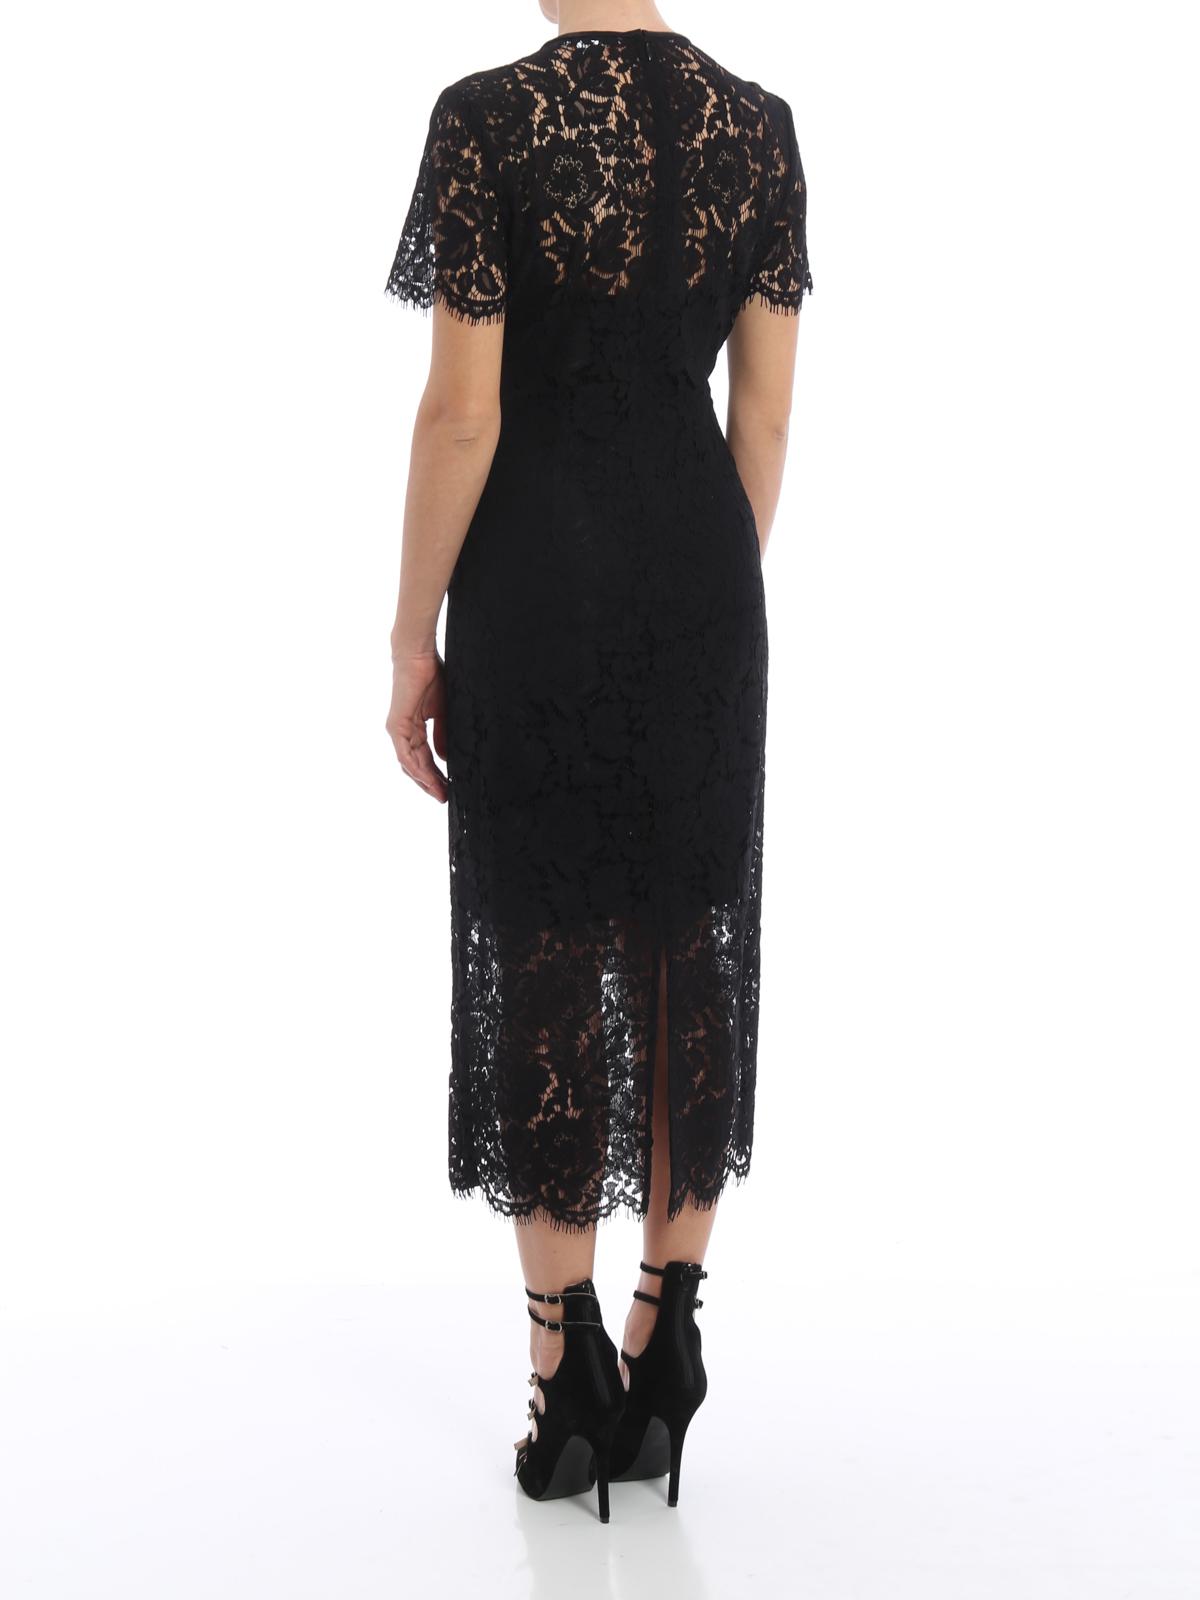 Carly floral lace dress by Diane Von Furstenberg - cocktail dresses ...